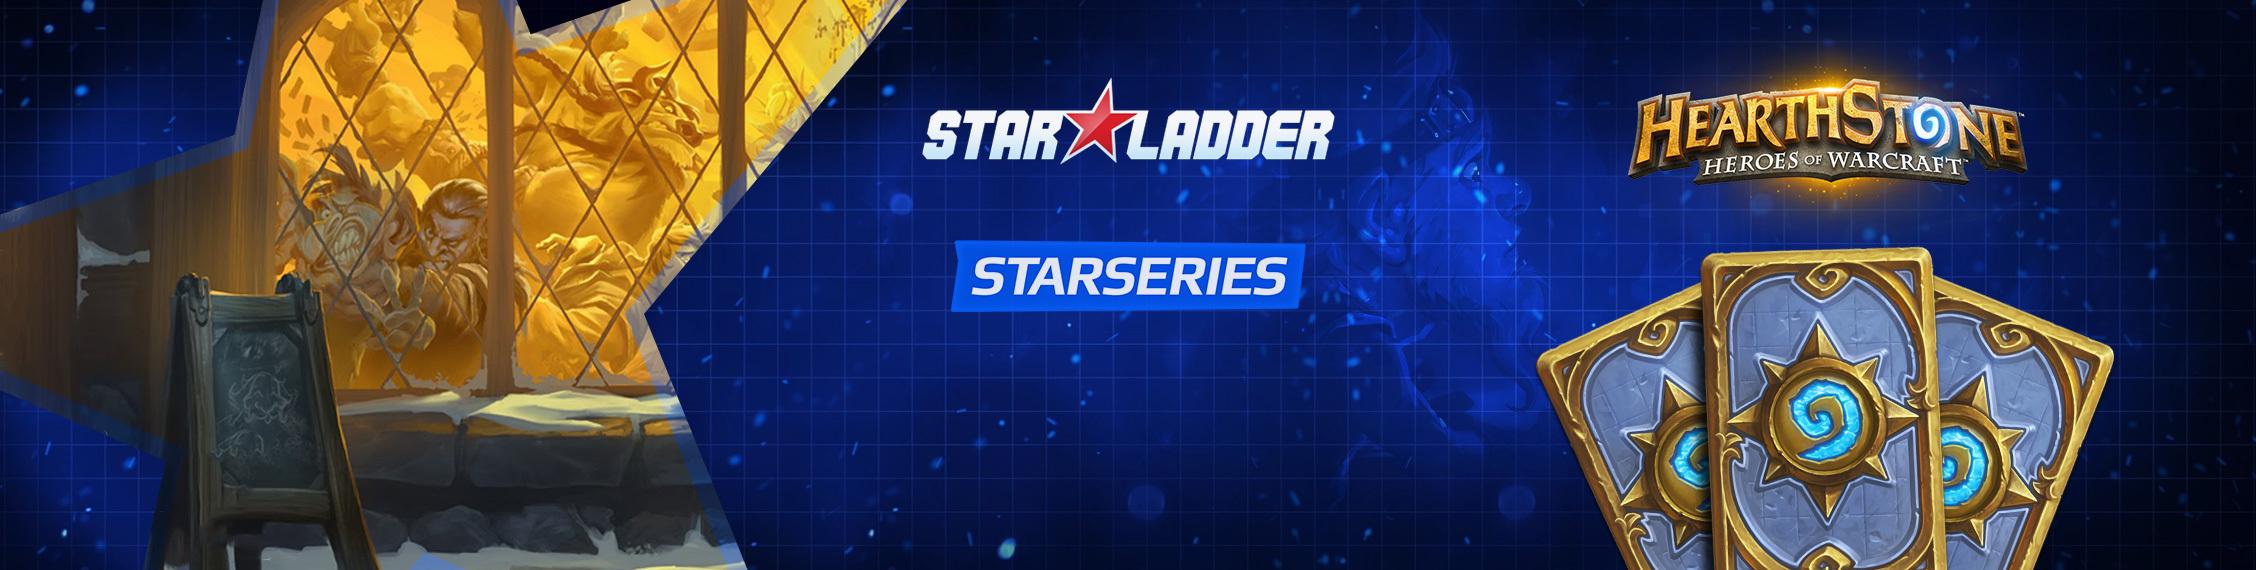 SL i-League StarSeries: Hearthstone